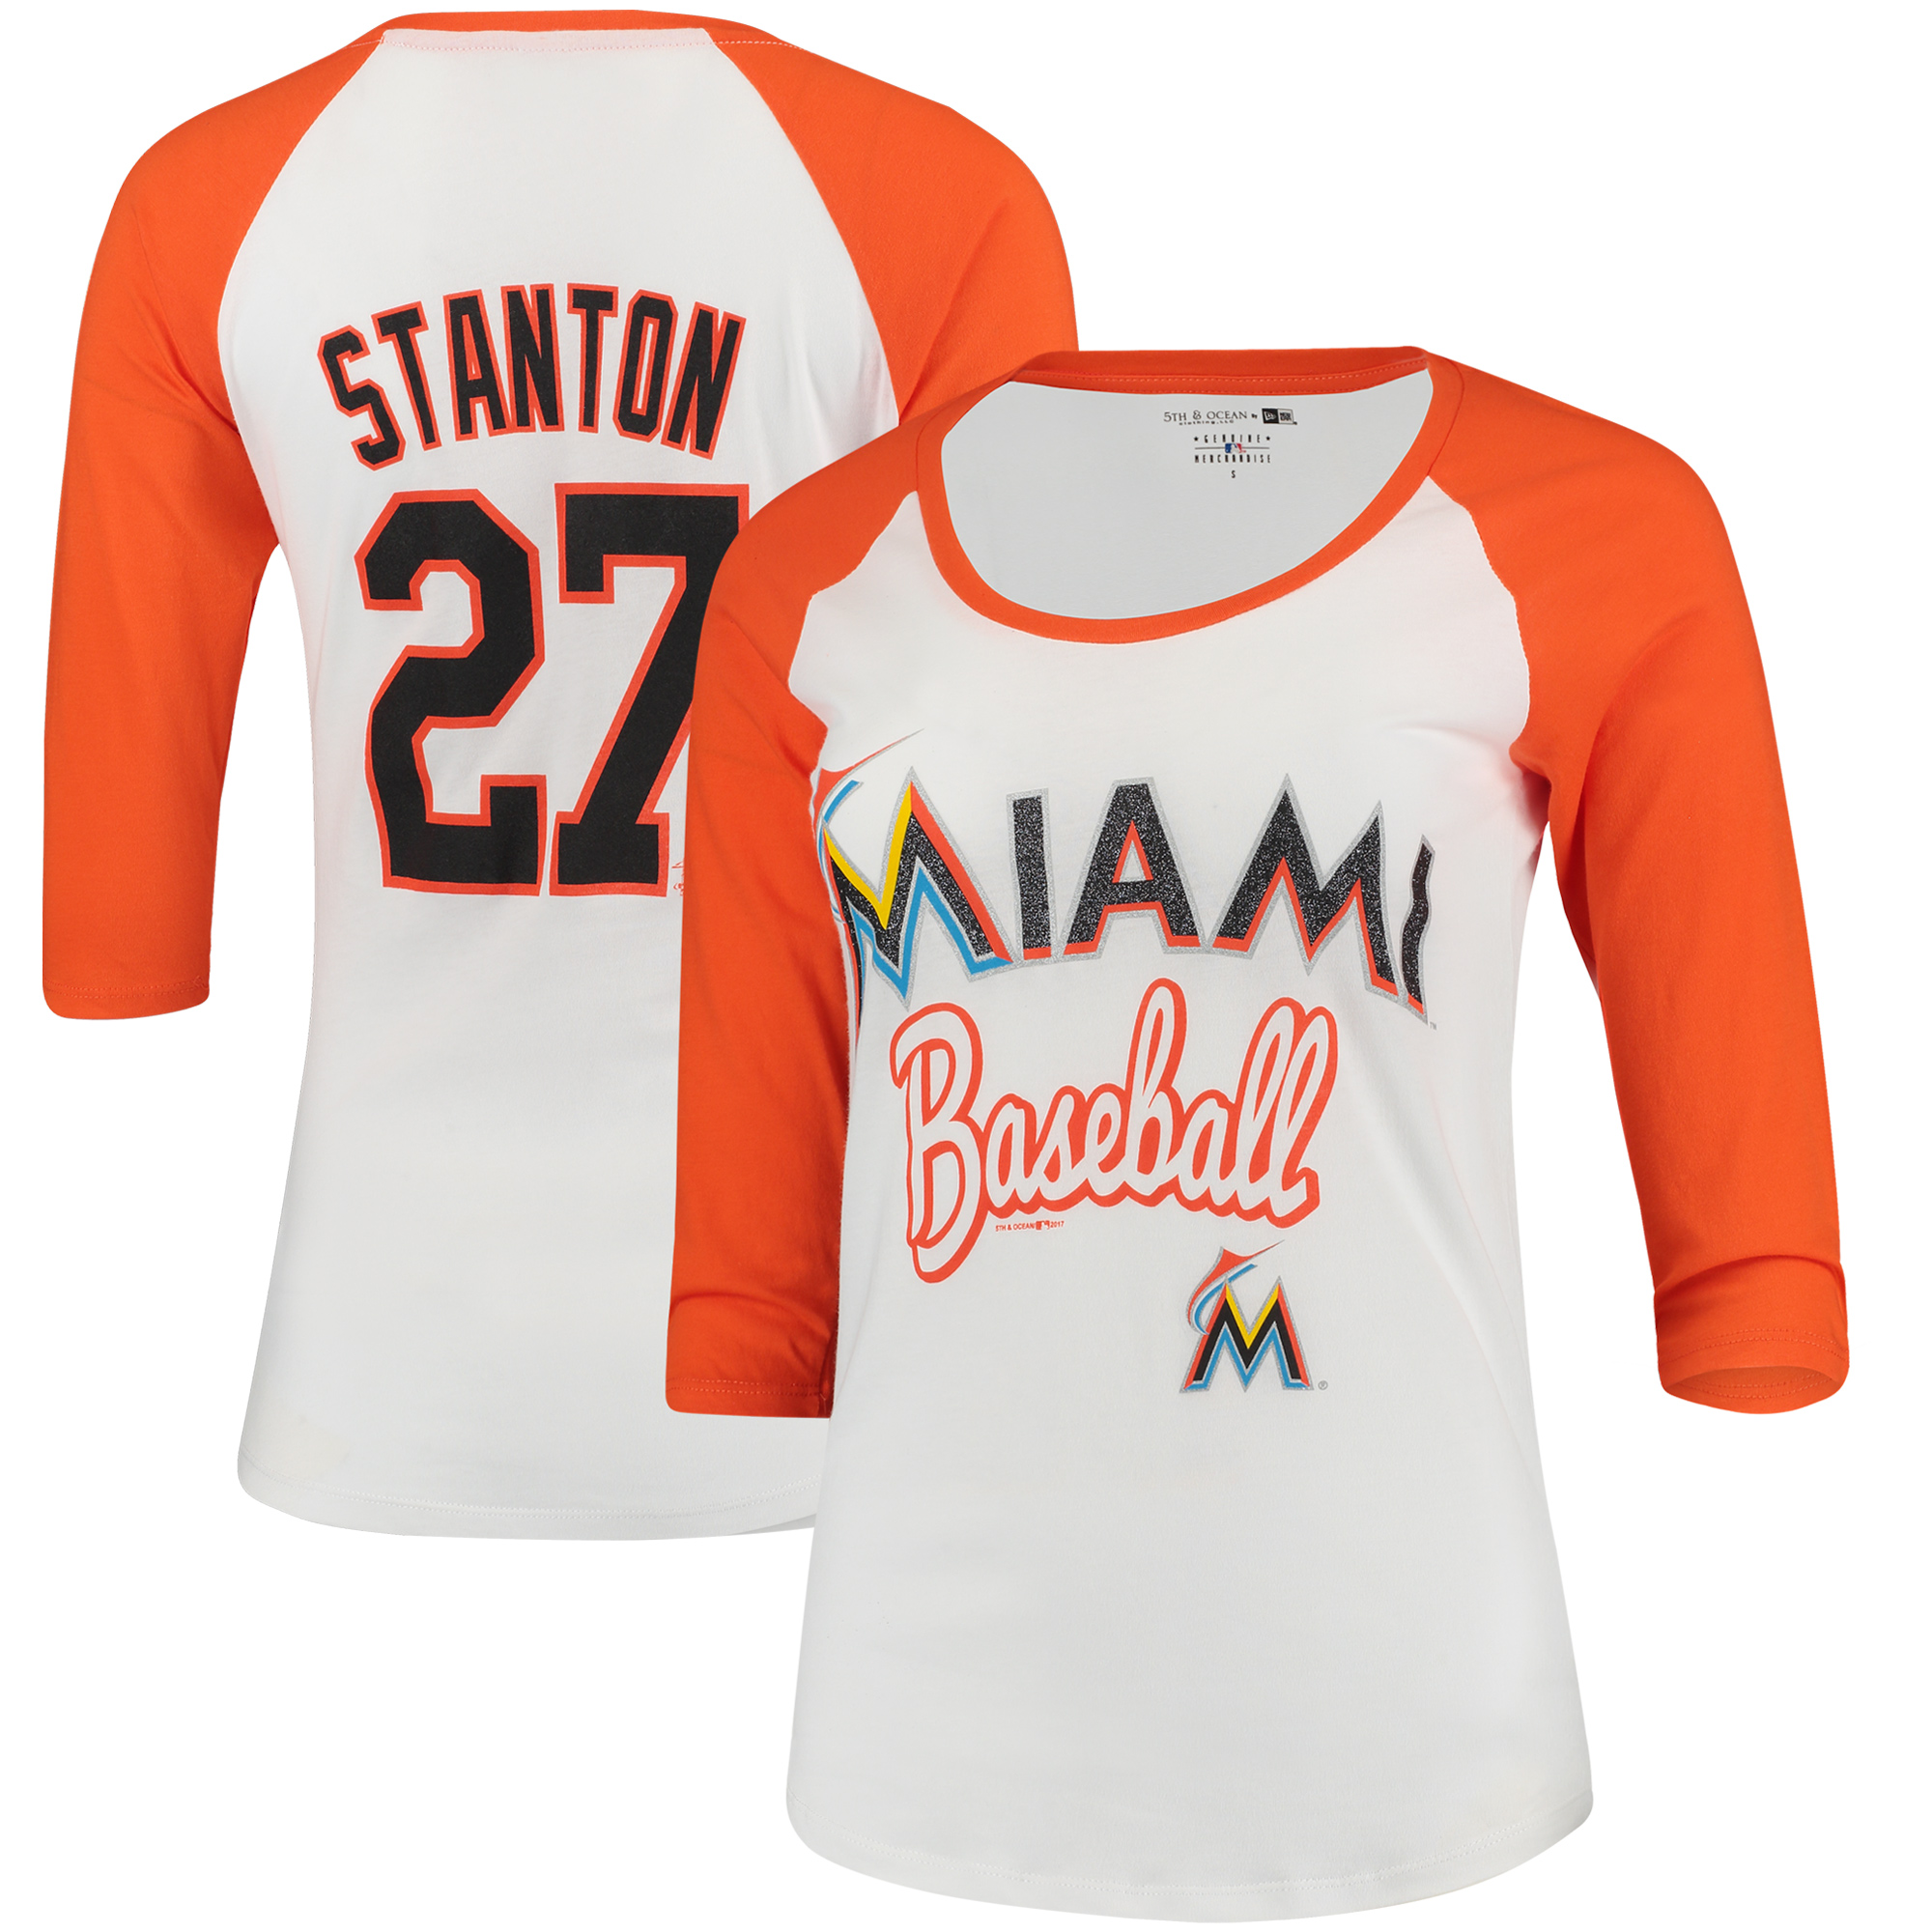 Giancarlo Stanton Miami Marlins 5th & Ocean by New Era Women's Glitter 3/4-Sleeve Raglan T-Shirt - White/Orange